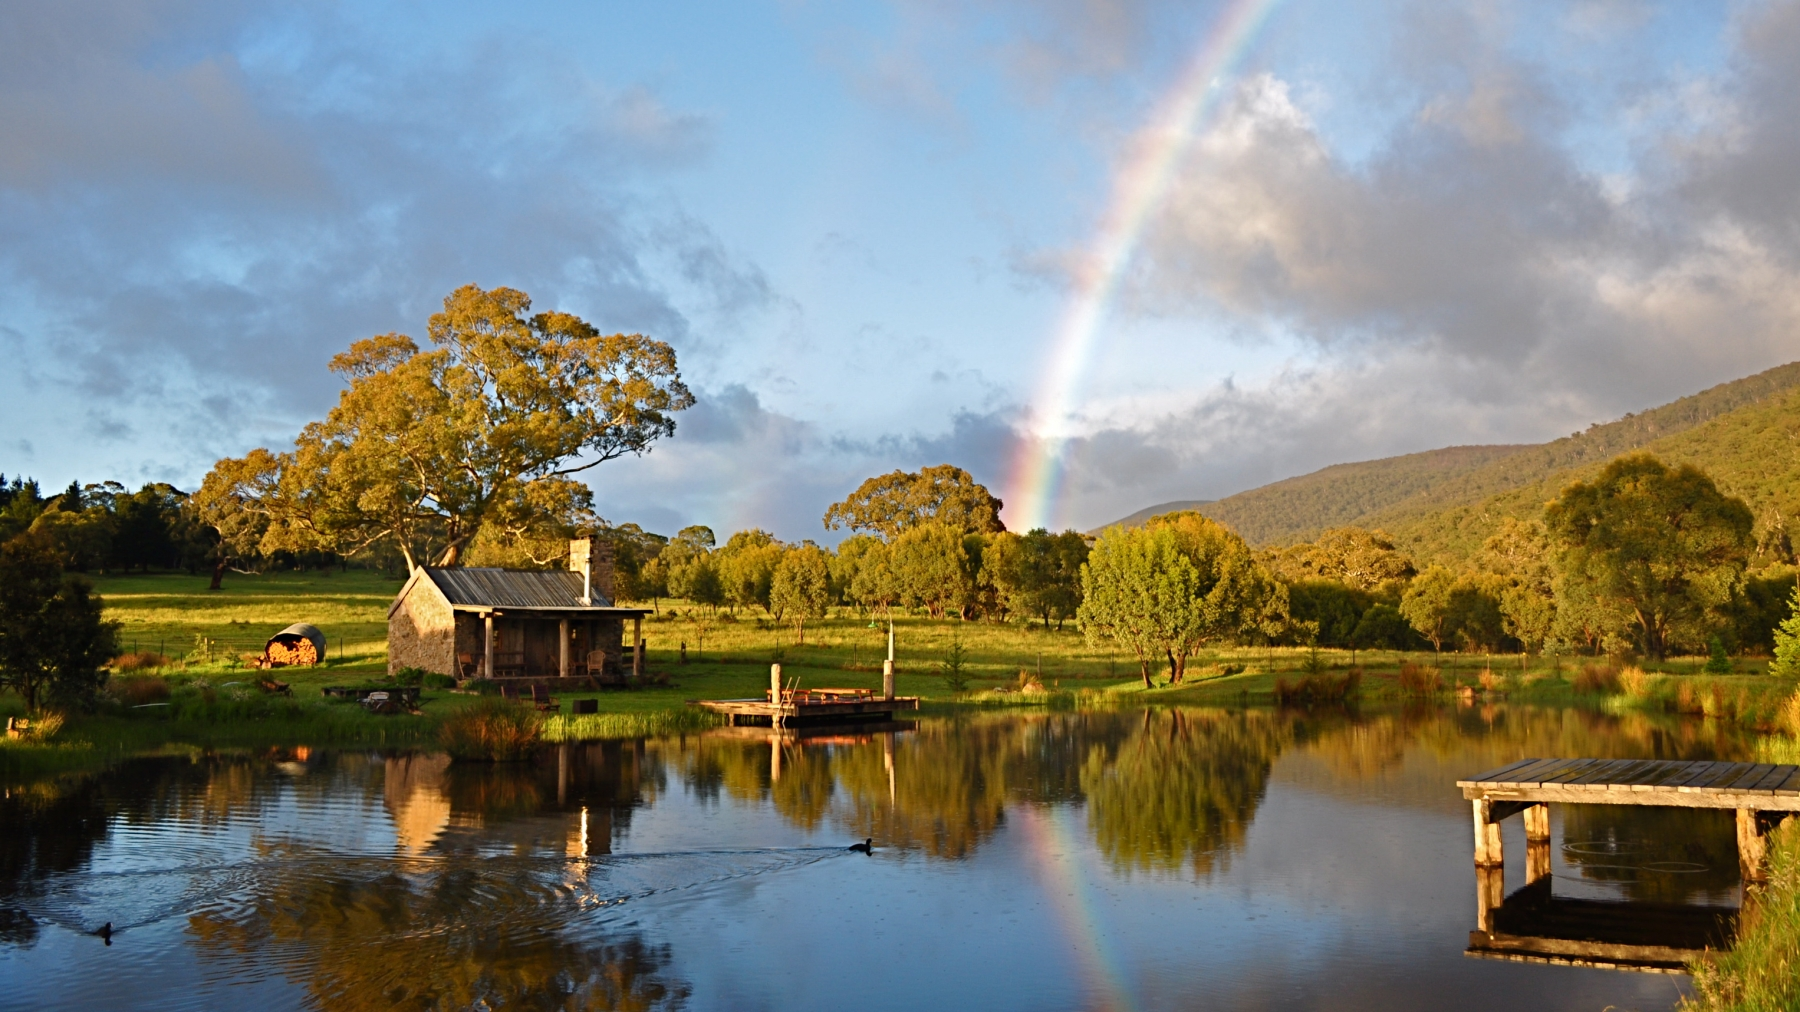 Pot of Gold at the end of the rainbow - Moonbah Lake Hut